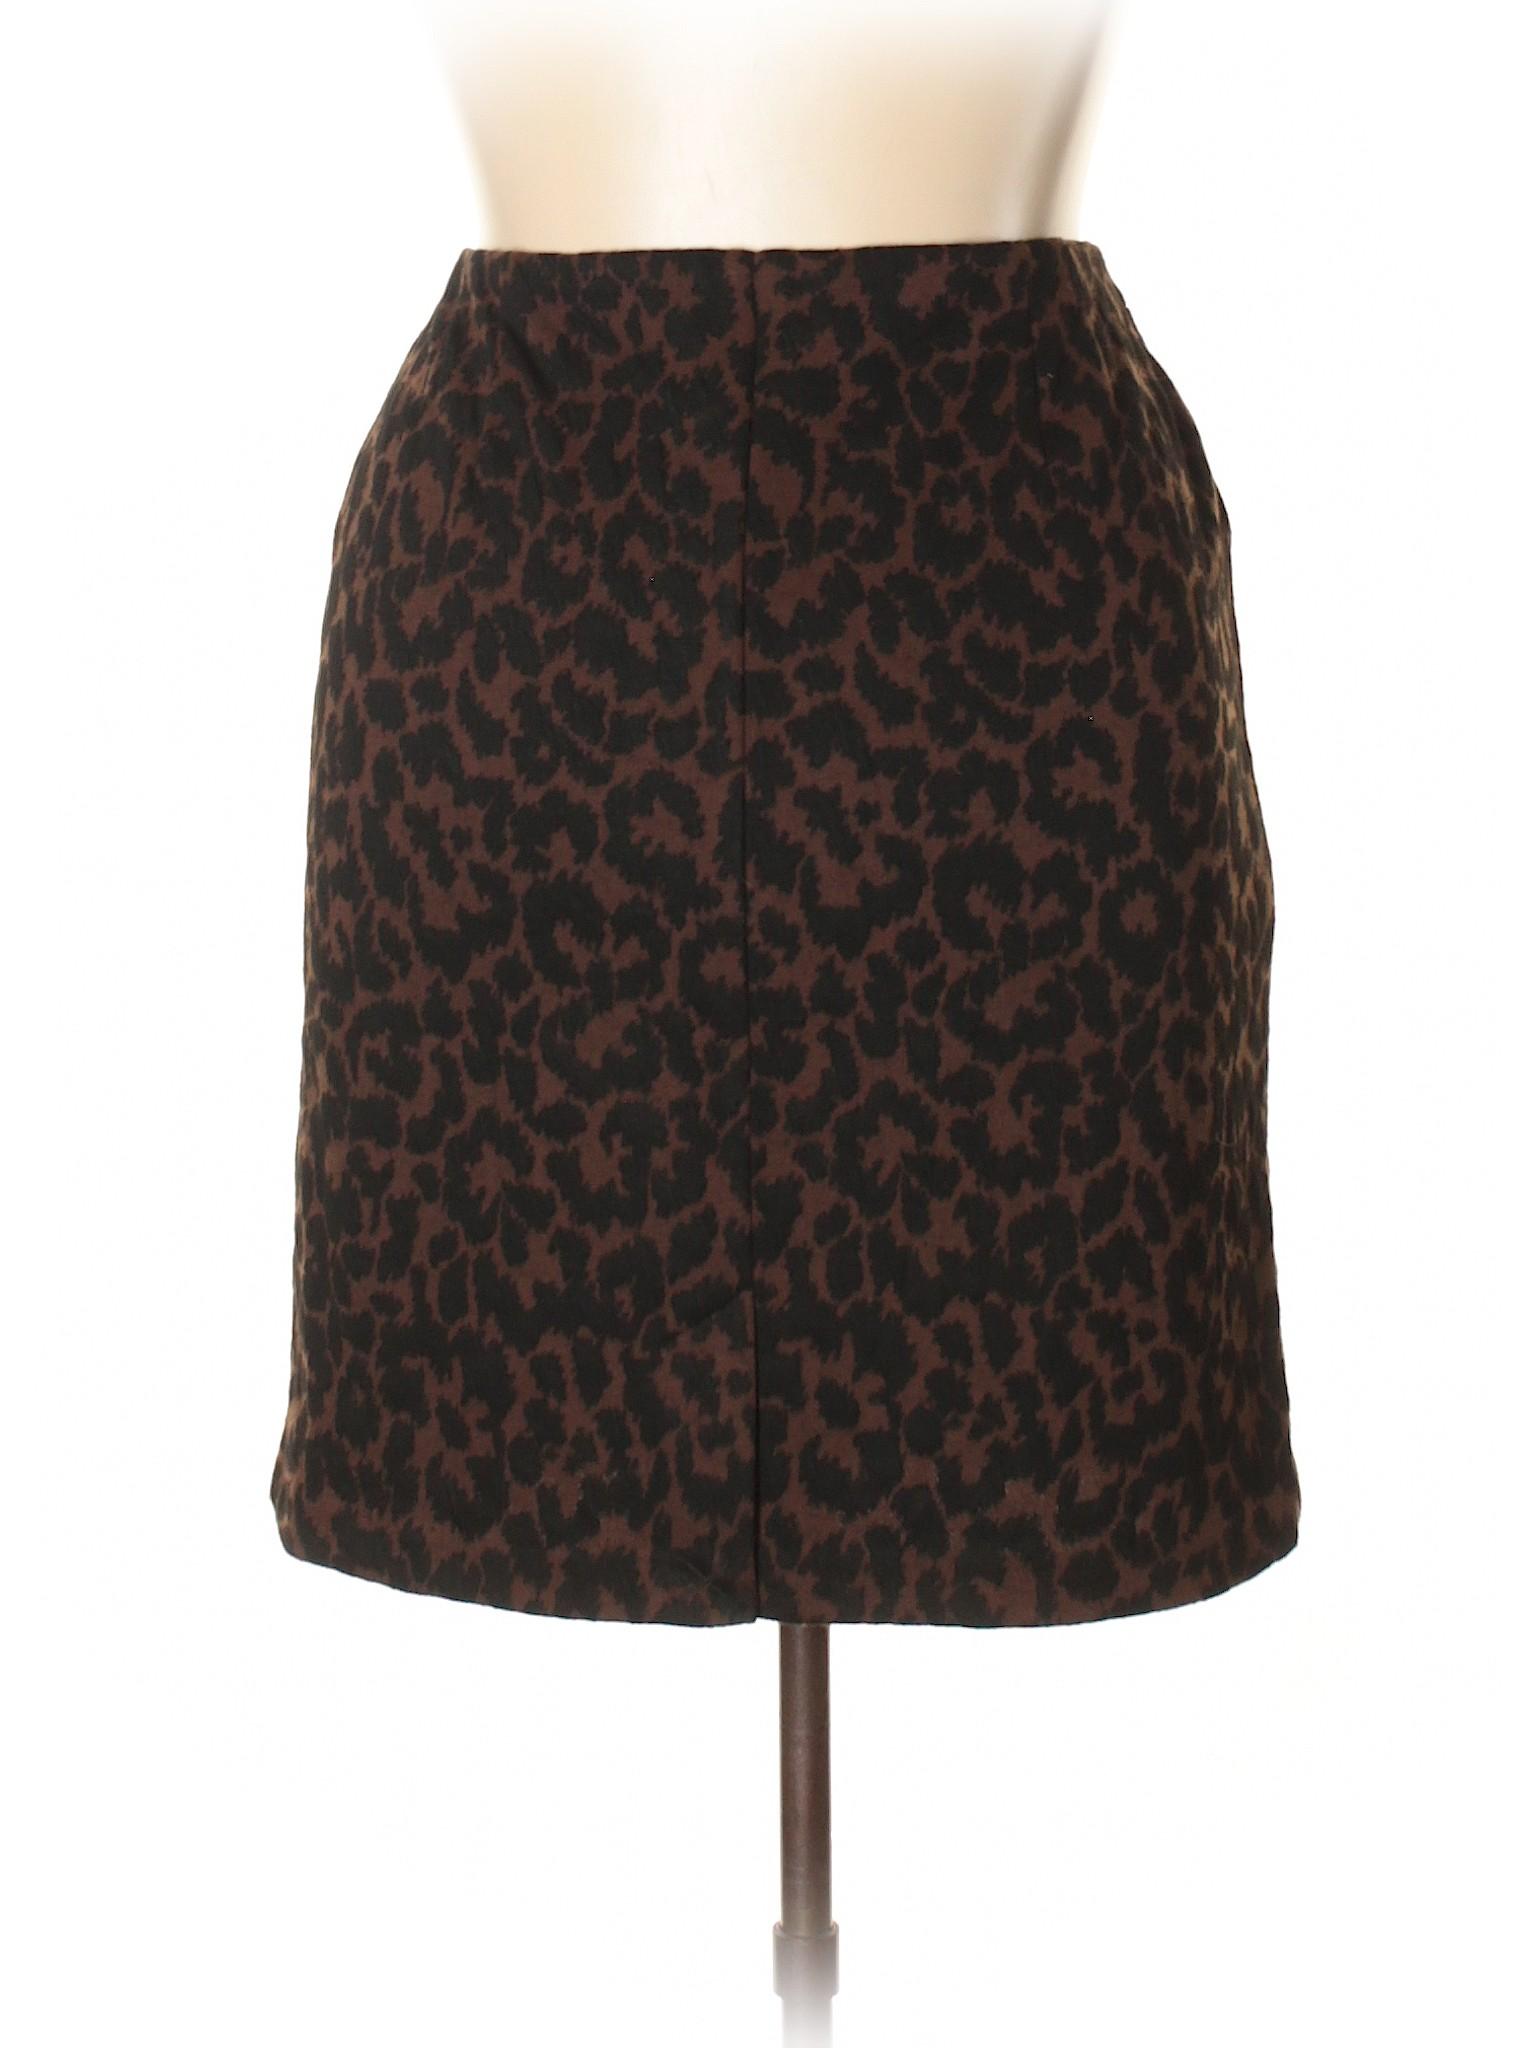 Skirt Boutique Boutique Casual Casual qxOw5C8C